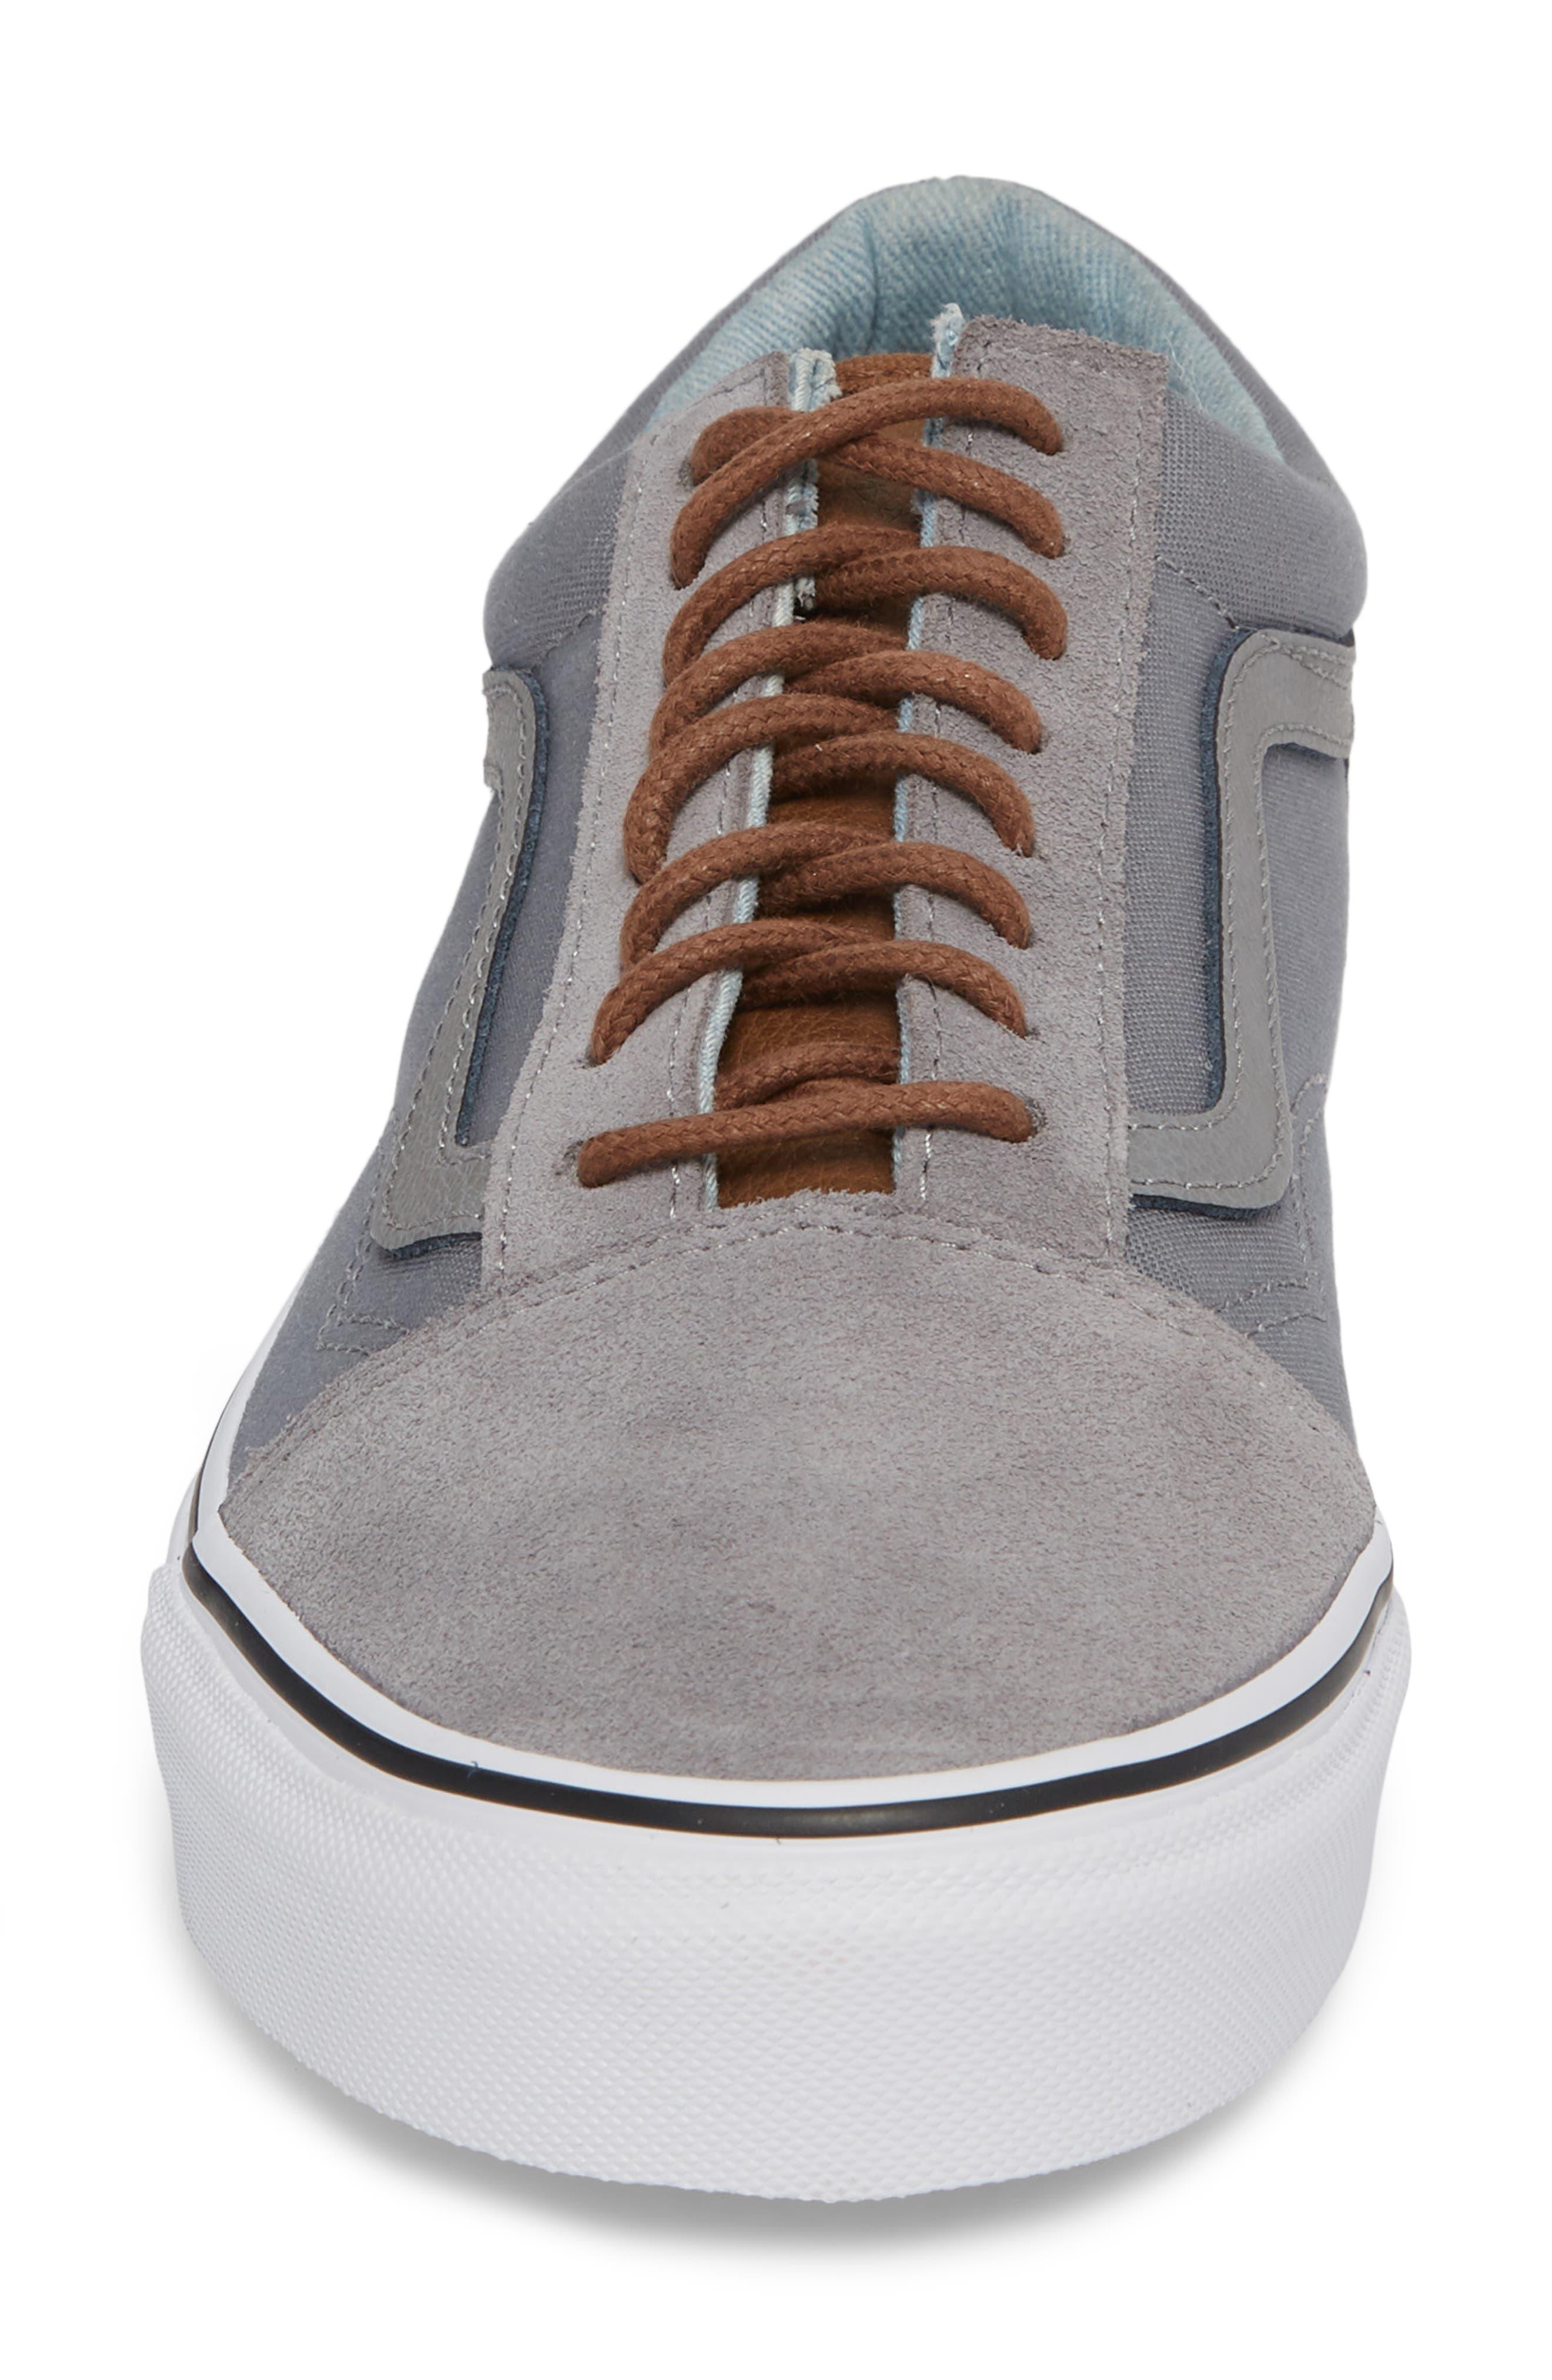 Old Skool Low Top Sneaker,                             Alternate thumbnail 4, color,                             Frost Grey/ Acid Denim Leather